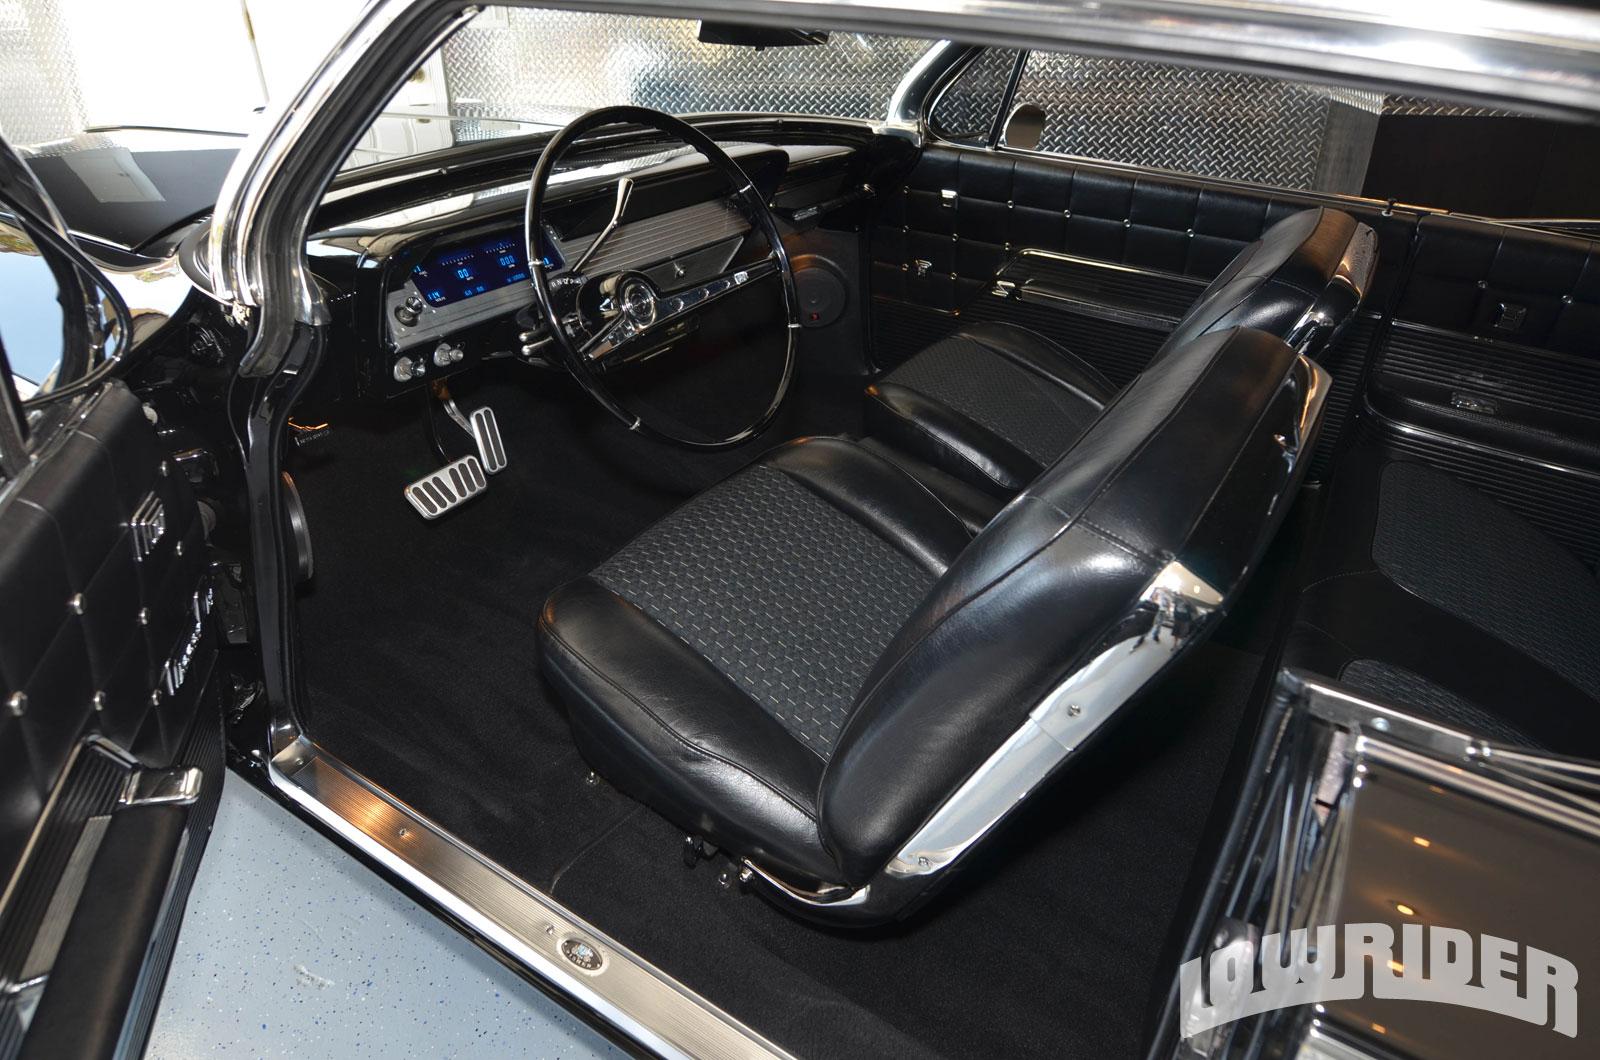 1962 Chevrolet Impala - Lowrider Magazine